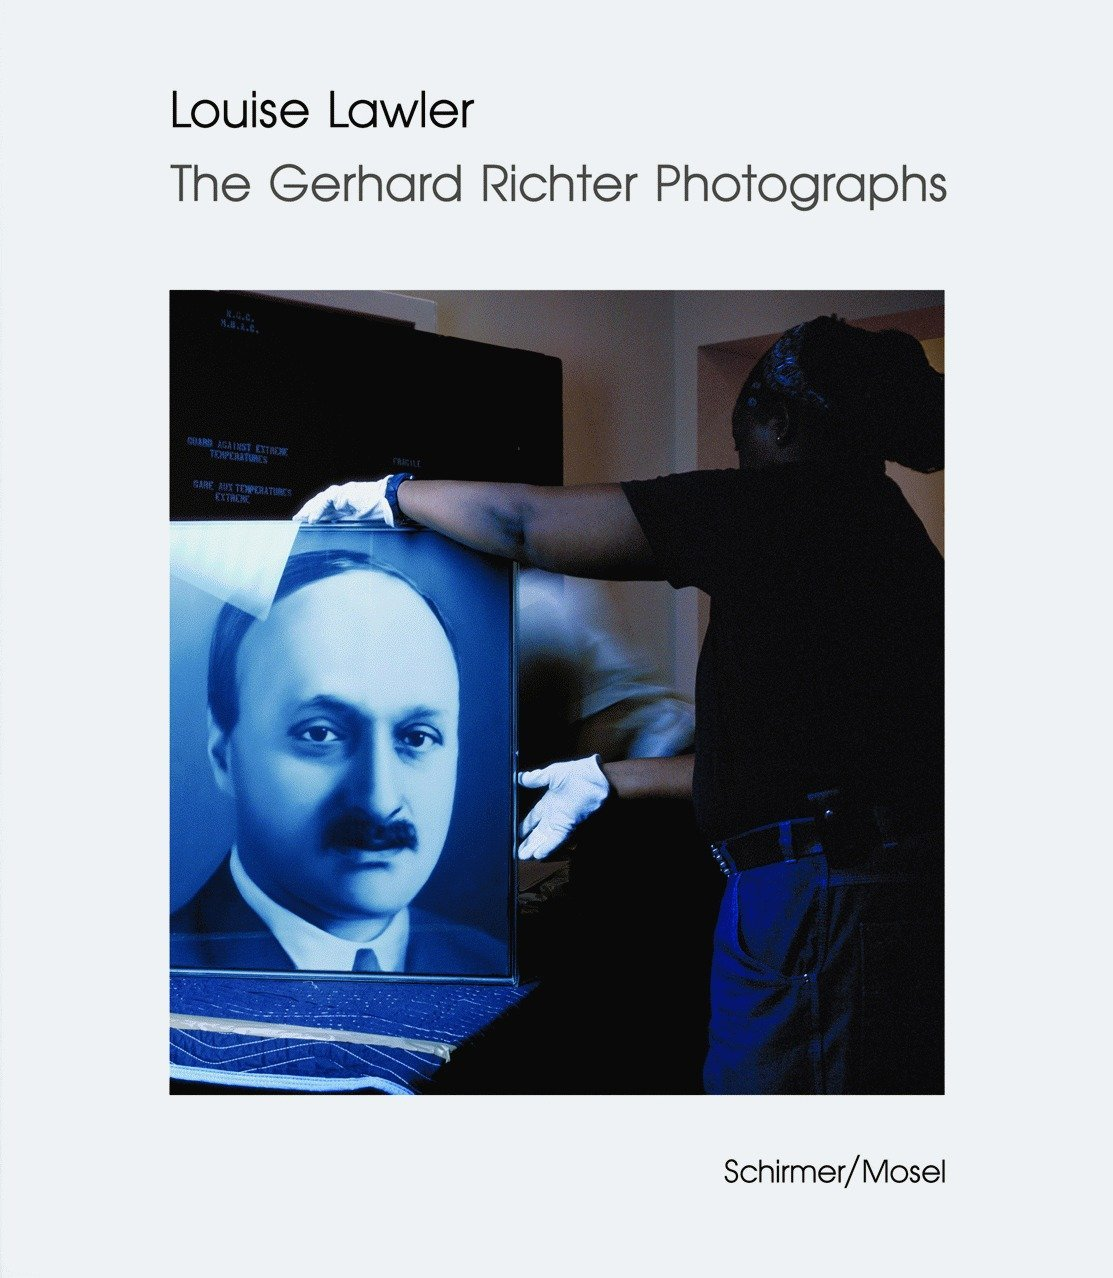 Louise Lawler: The Gerhard Richter Photographs ebook